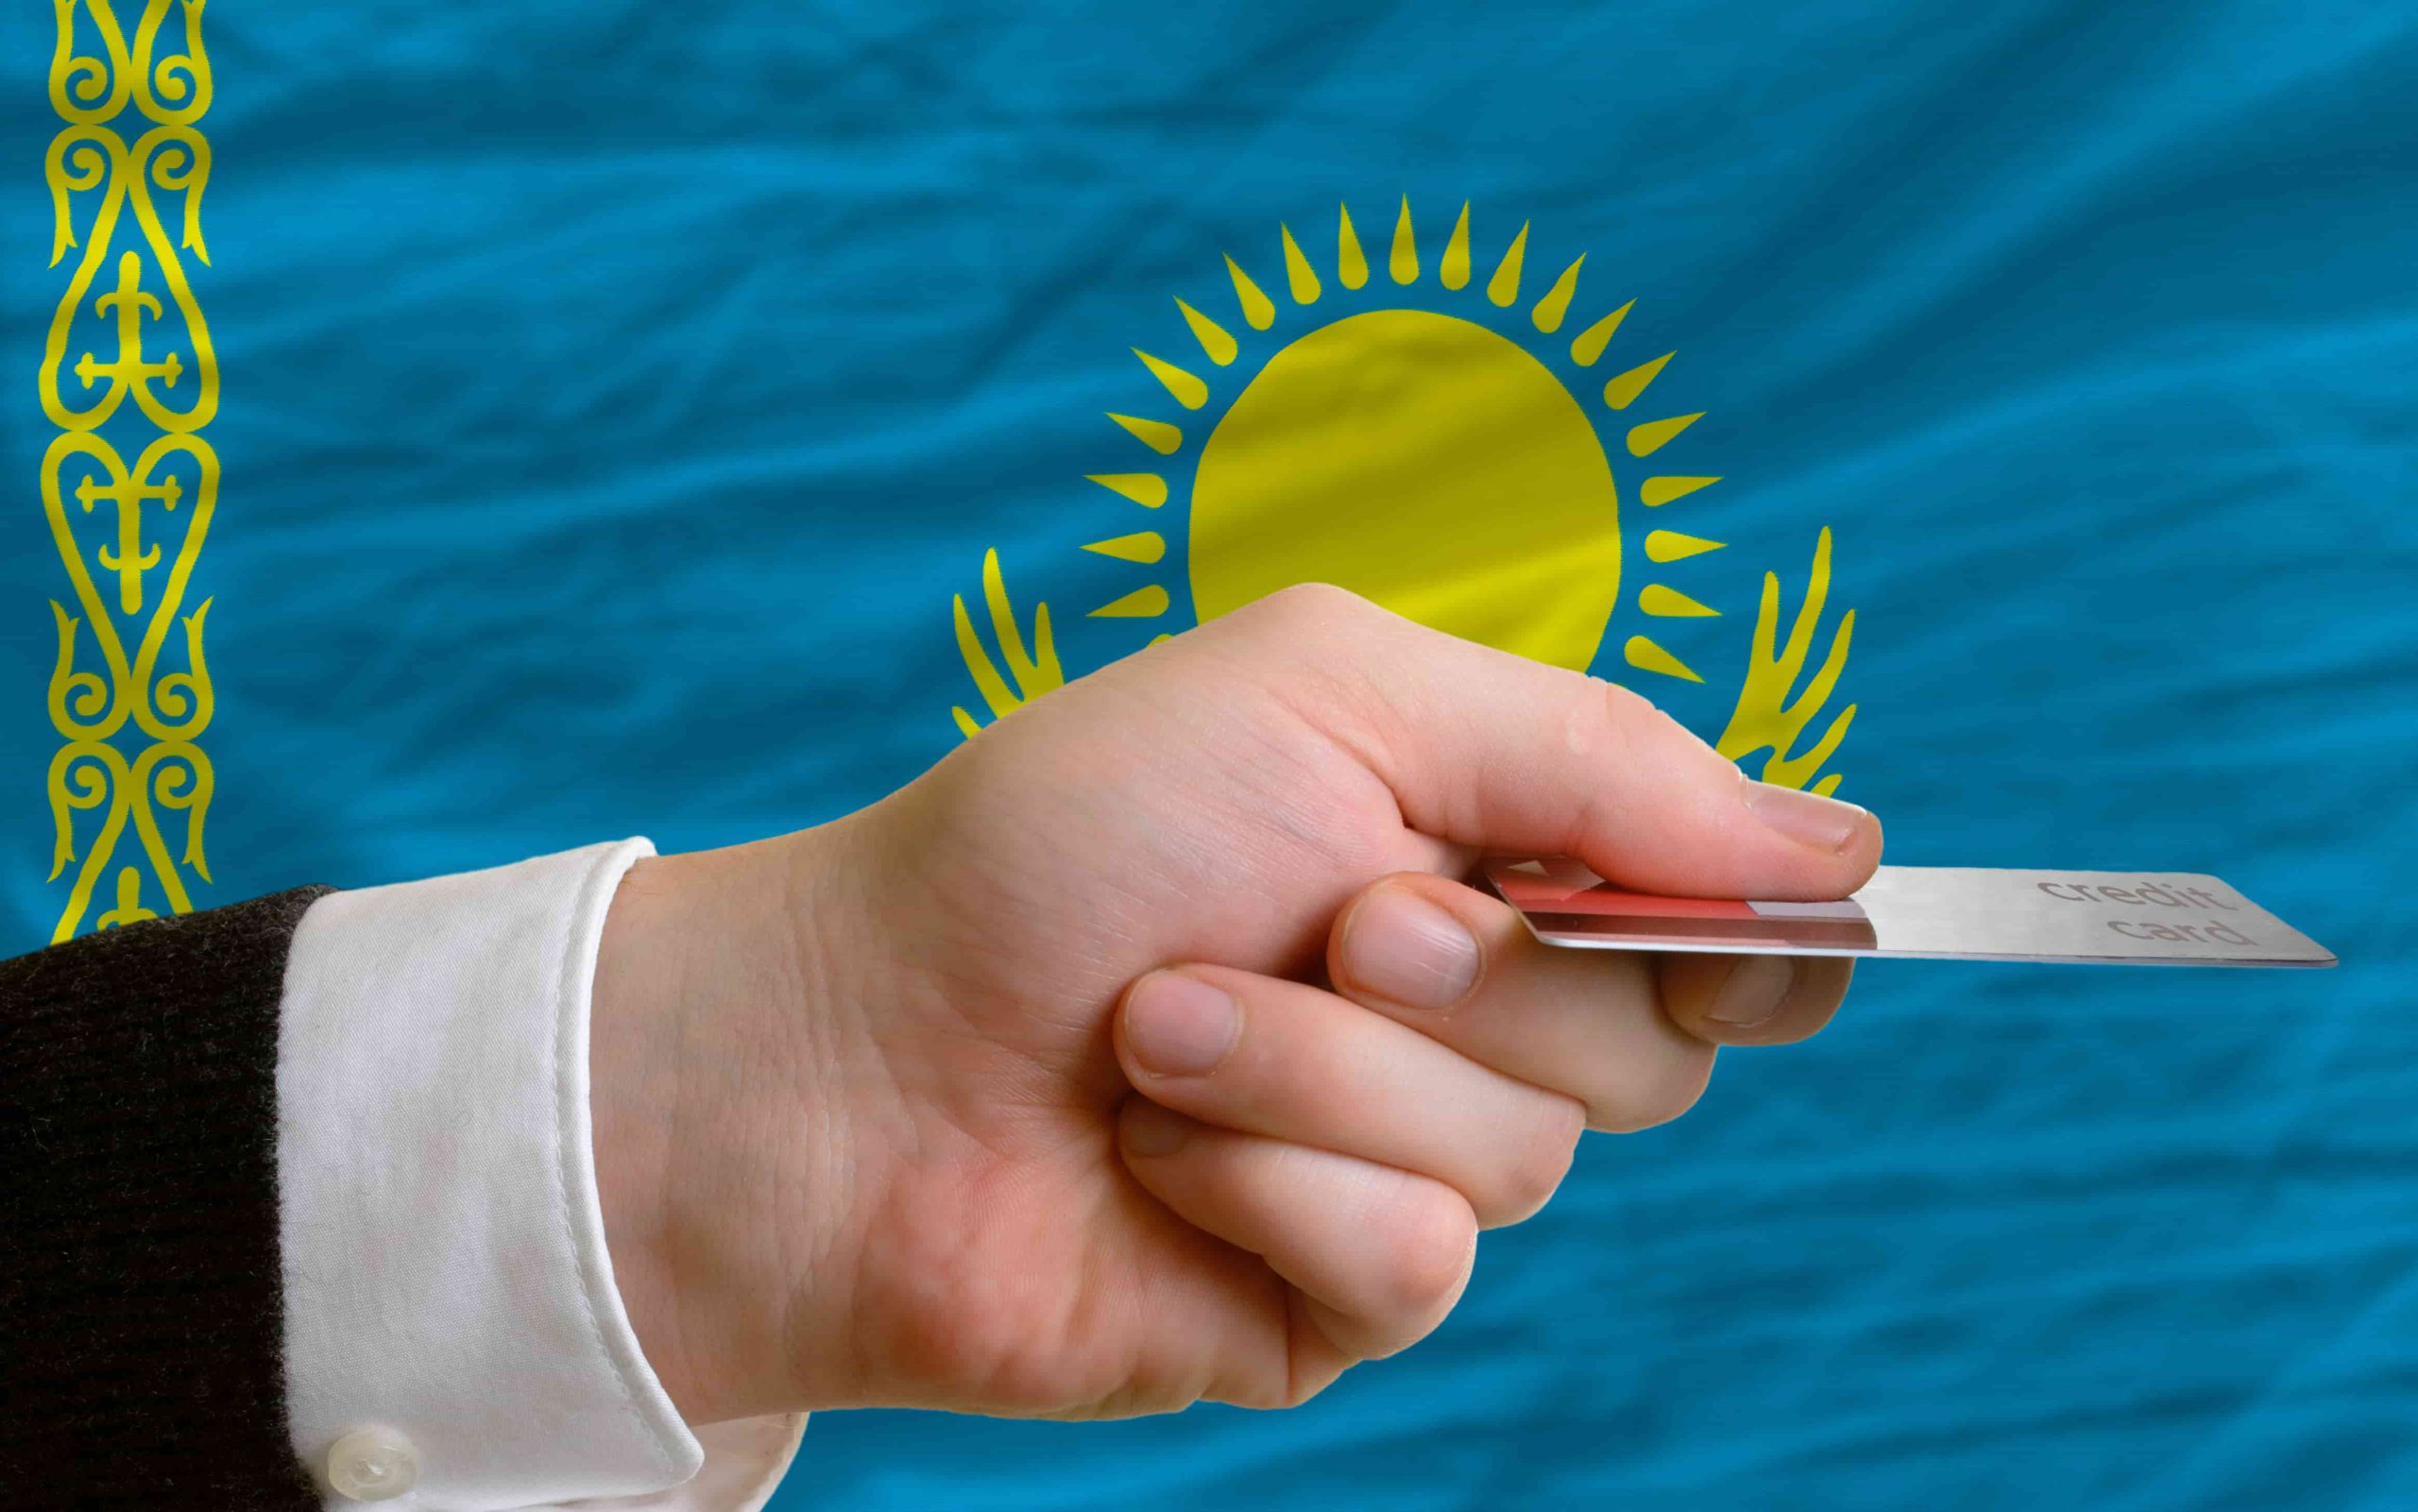 ТурбоМани онлайн займы в Казахстане на карту